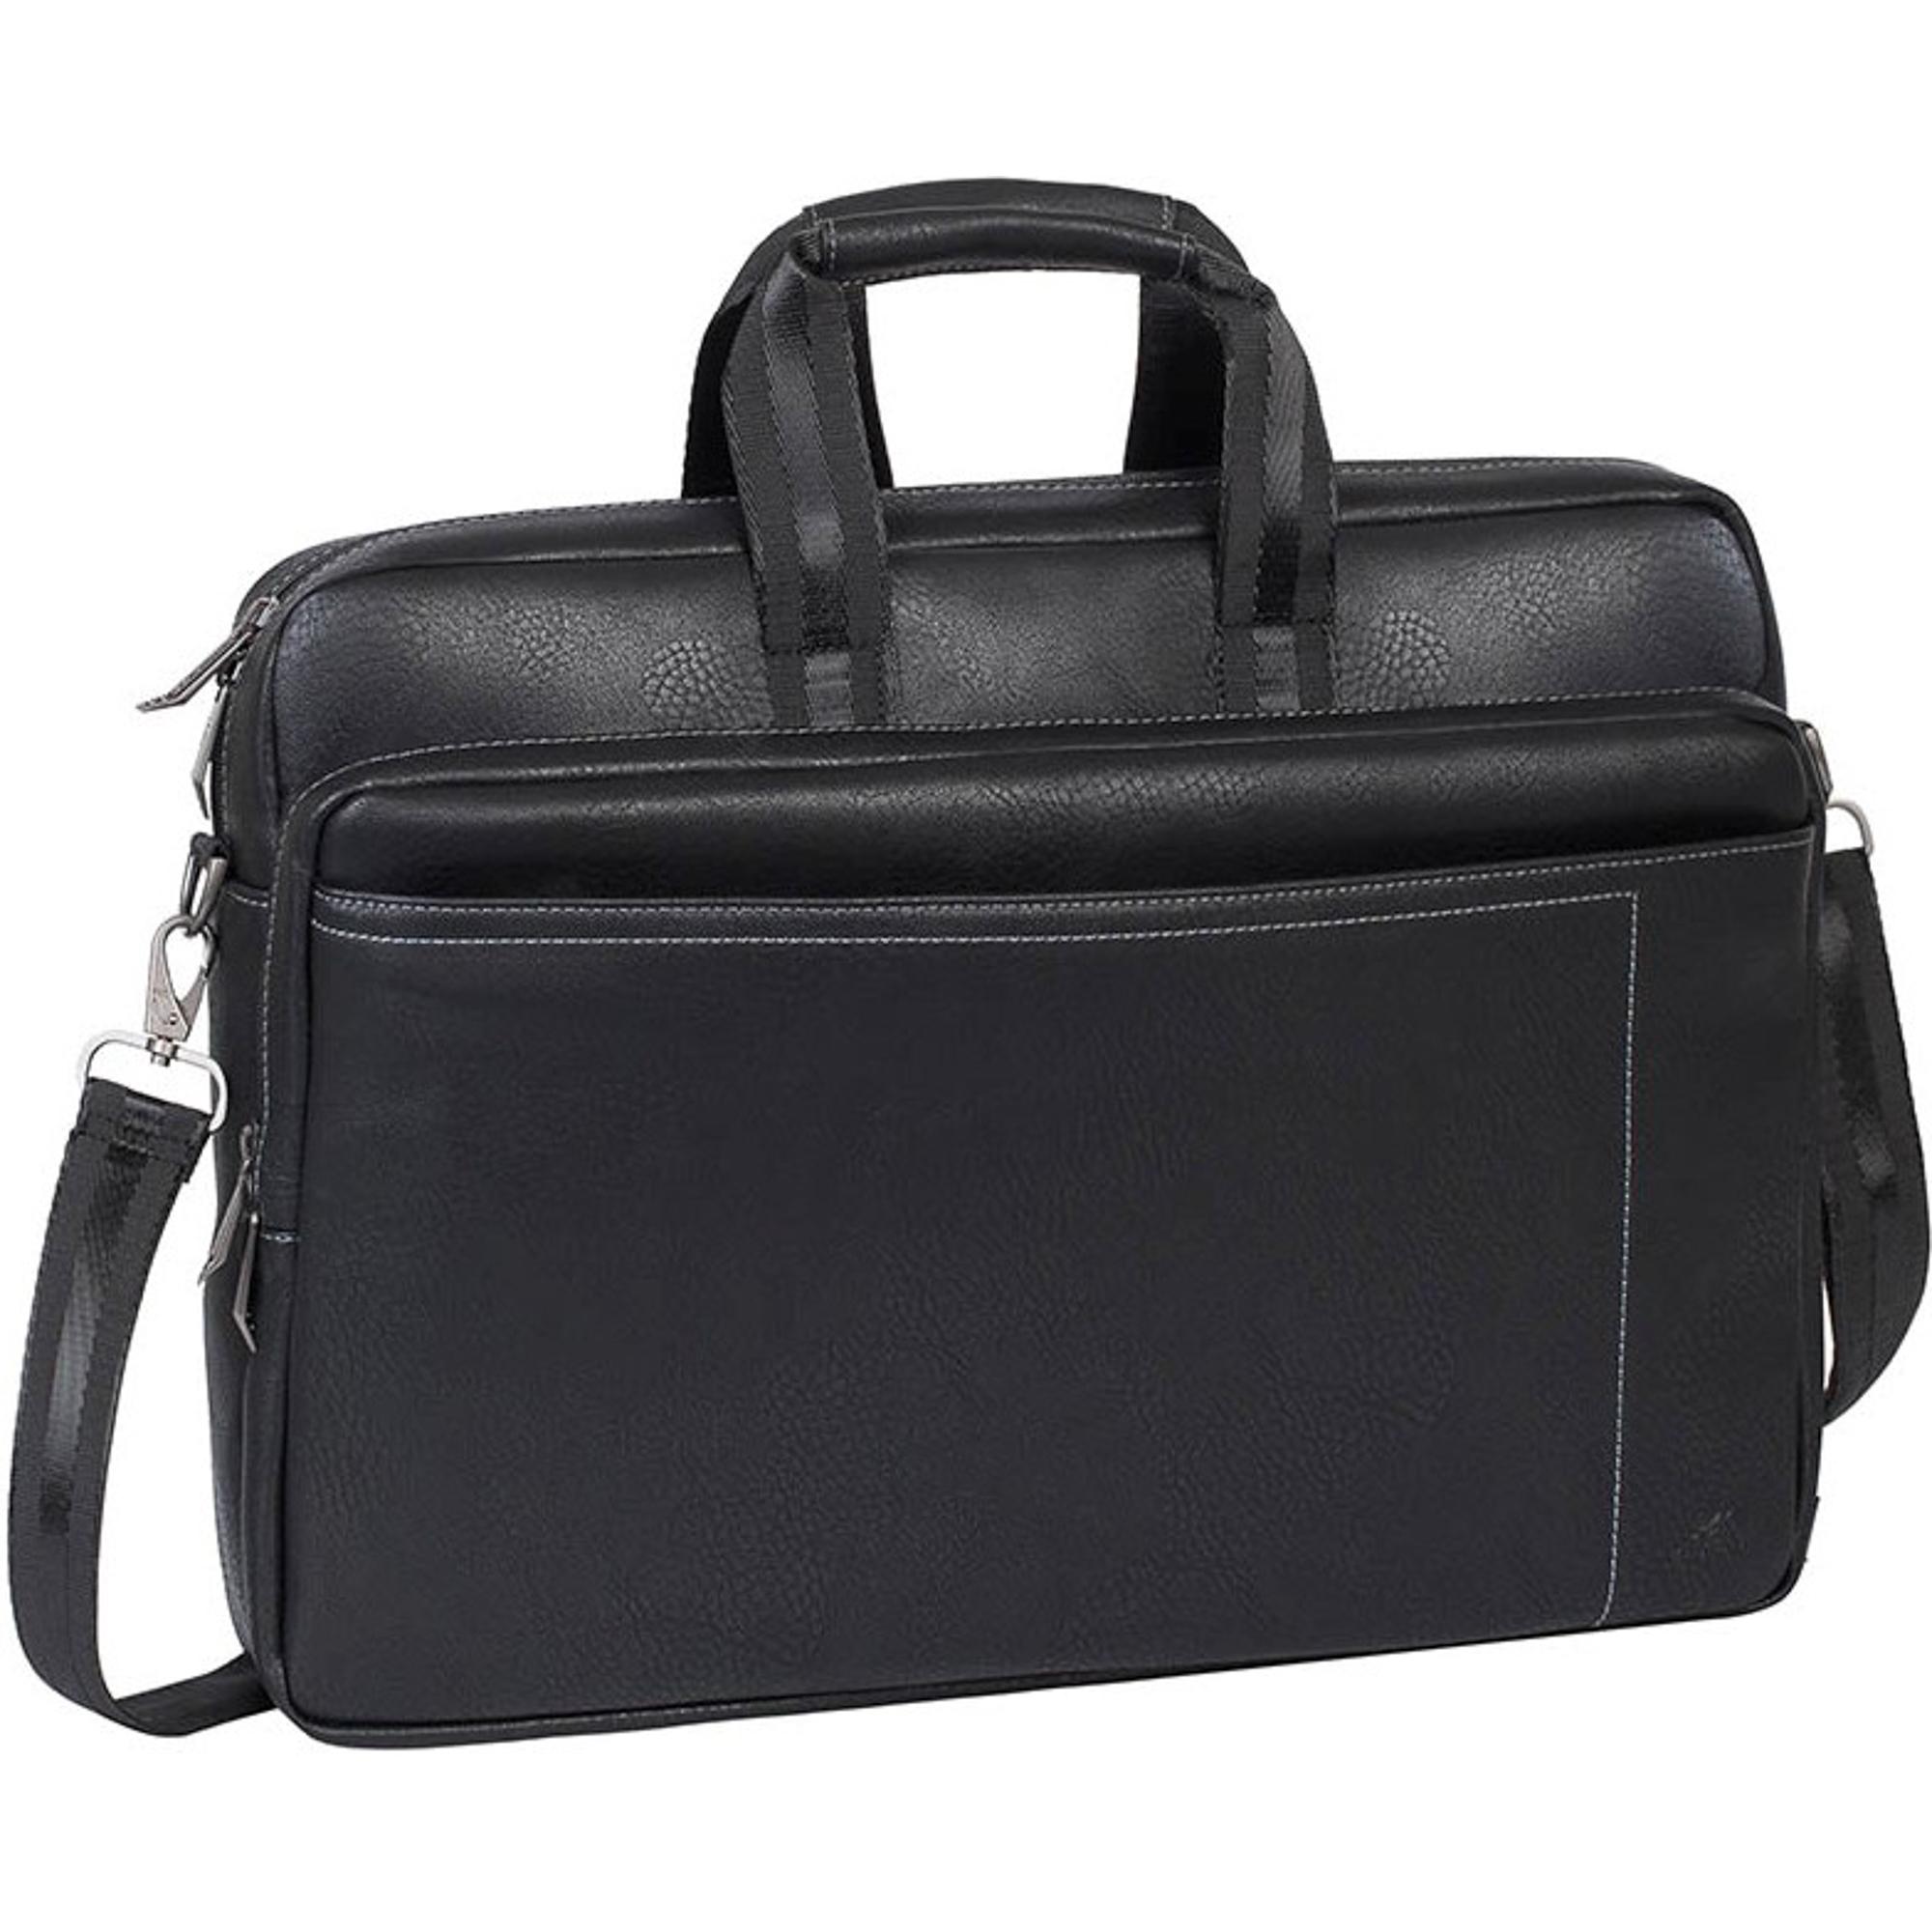 сумка для ноутбука rivacase 8920 13 3 black Сумка для ноутбука RivaCase 8940 Black